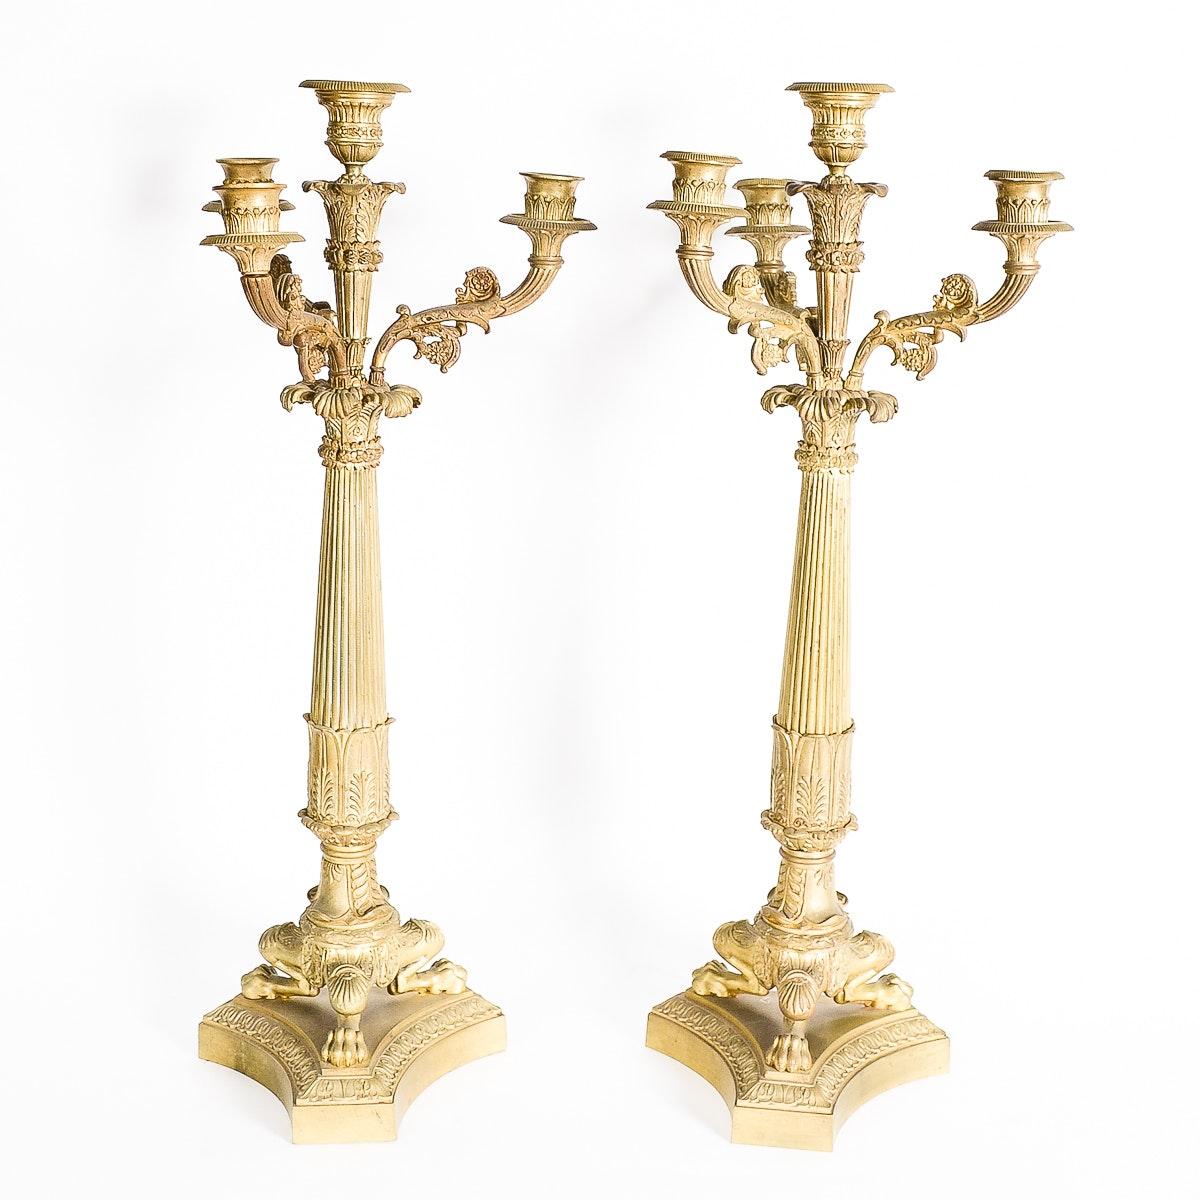 Pair of Antique Gilt Bronze Empire Style Bronze Candelabras